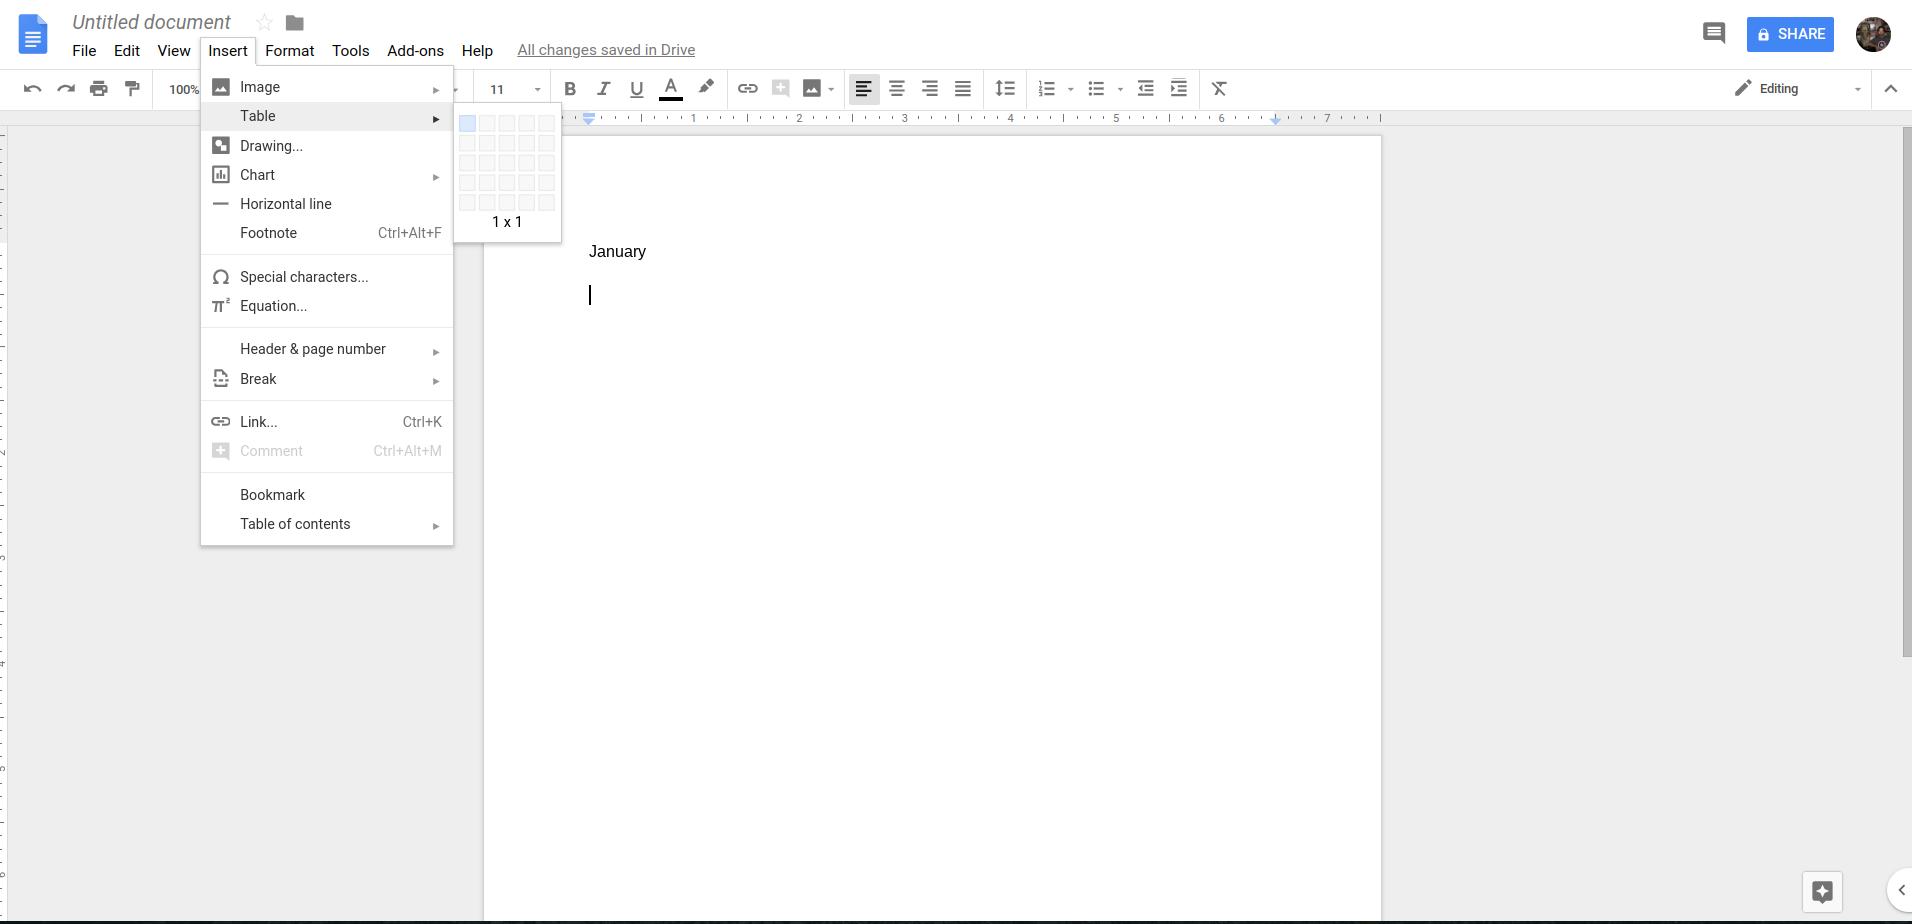 Google Docs Insert Table | DeviceDaily.com